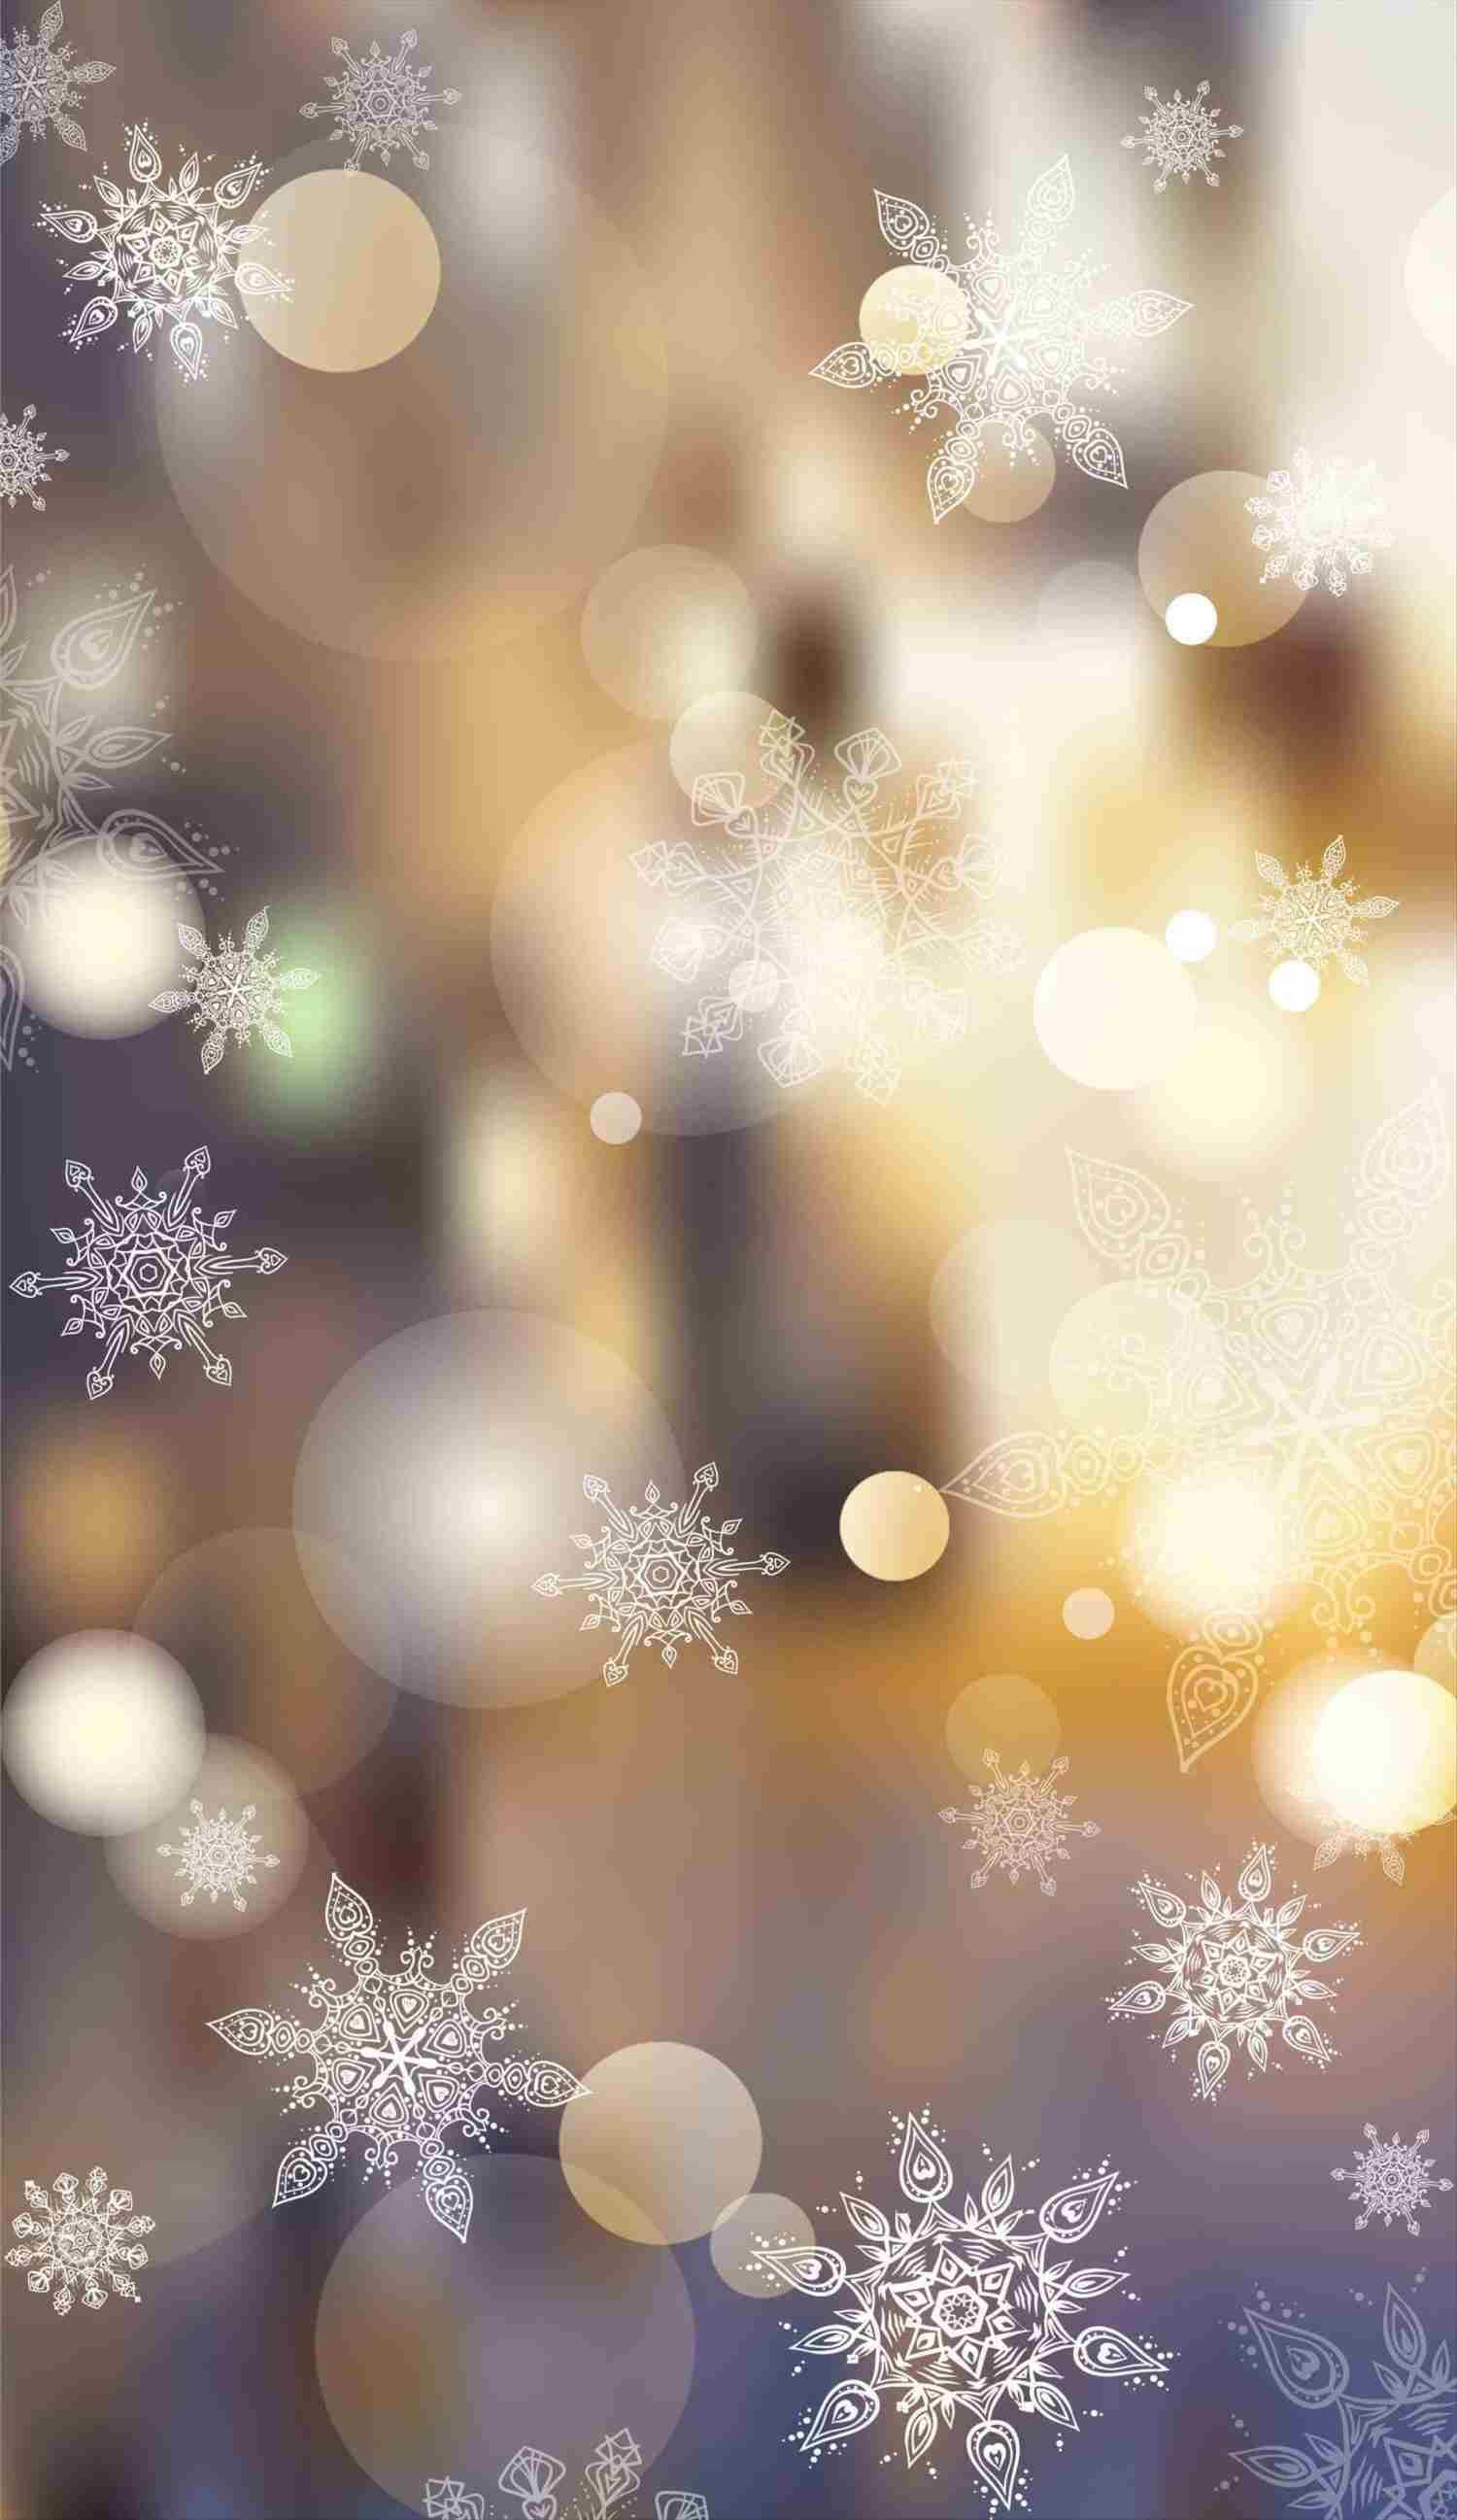 Rustic Christmas Iphone Wallpapers Top Free Rustic